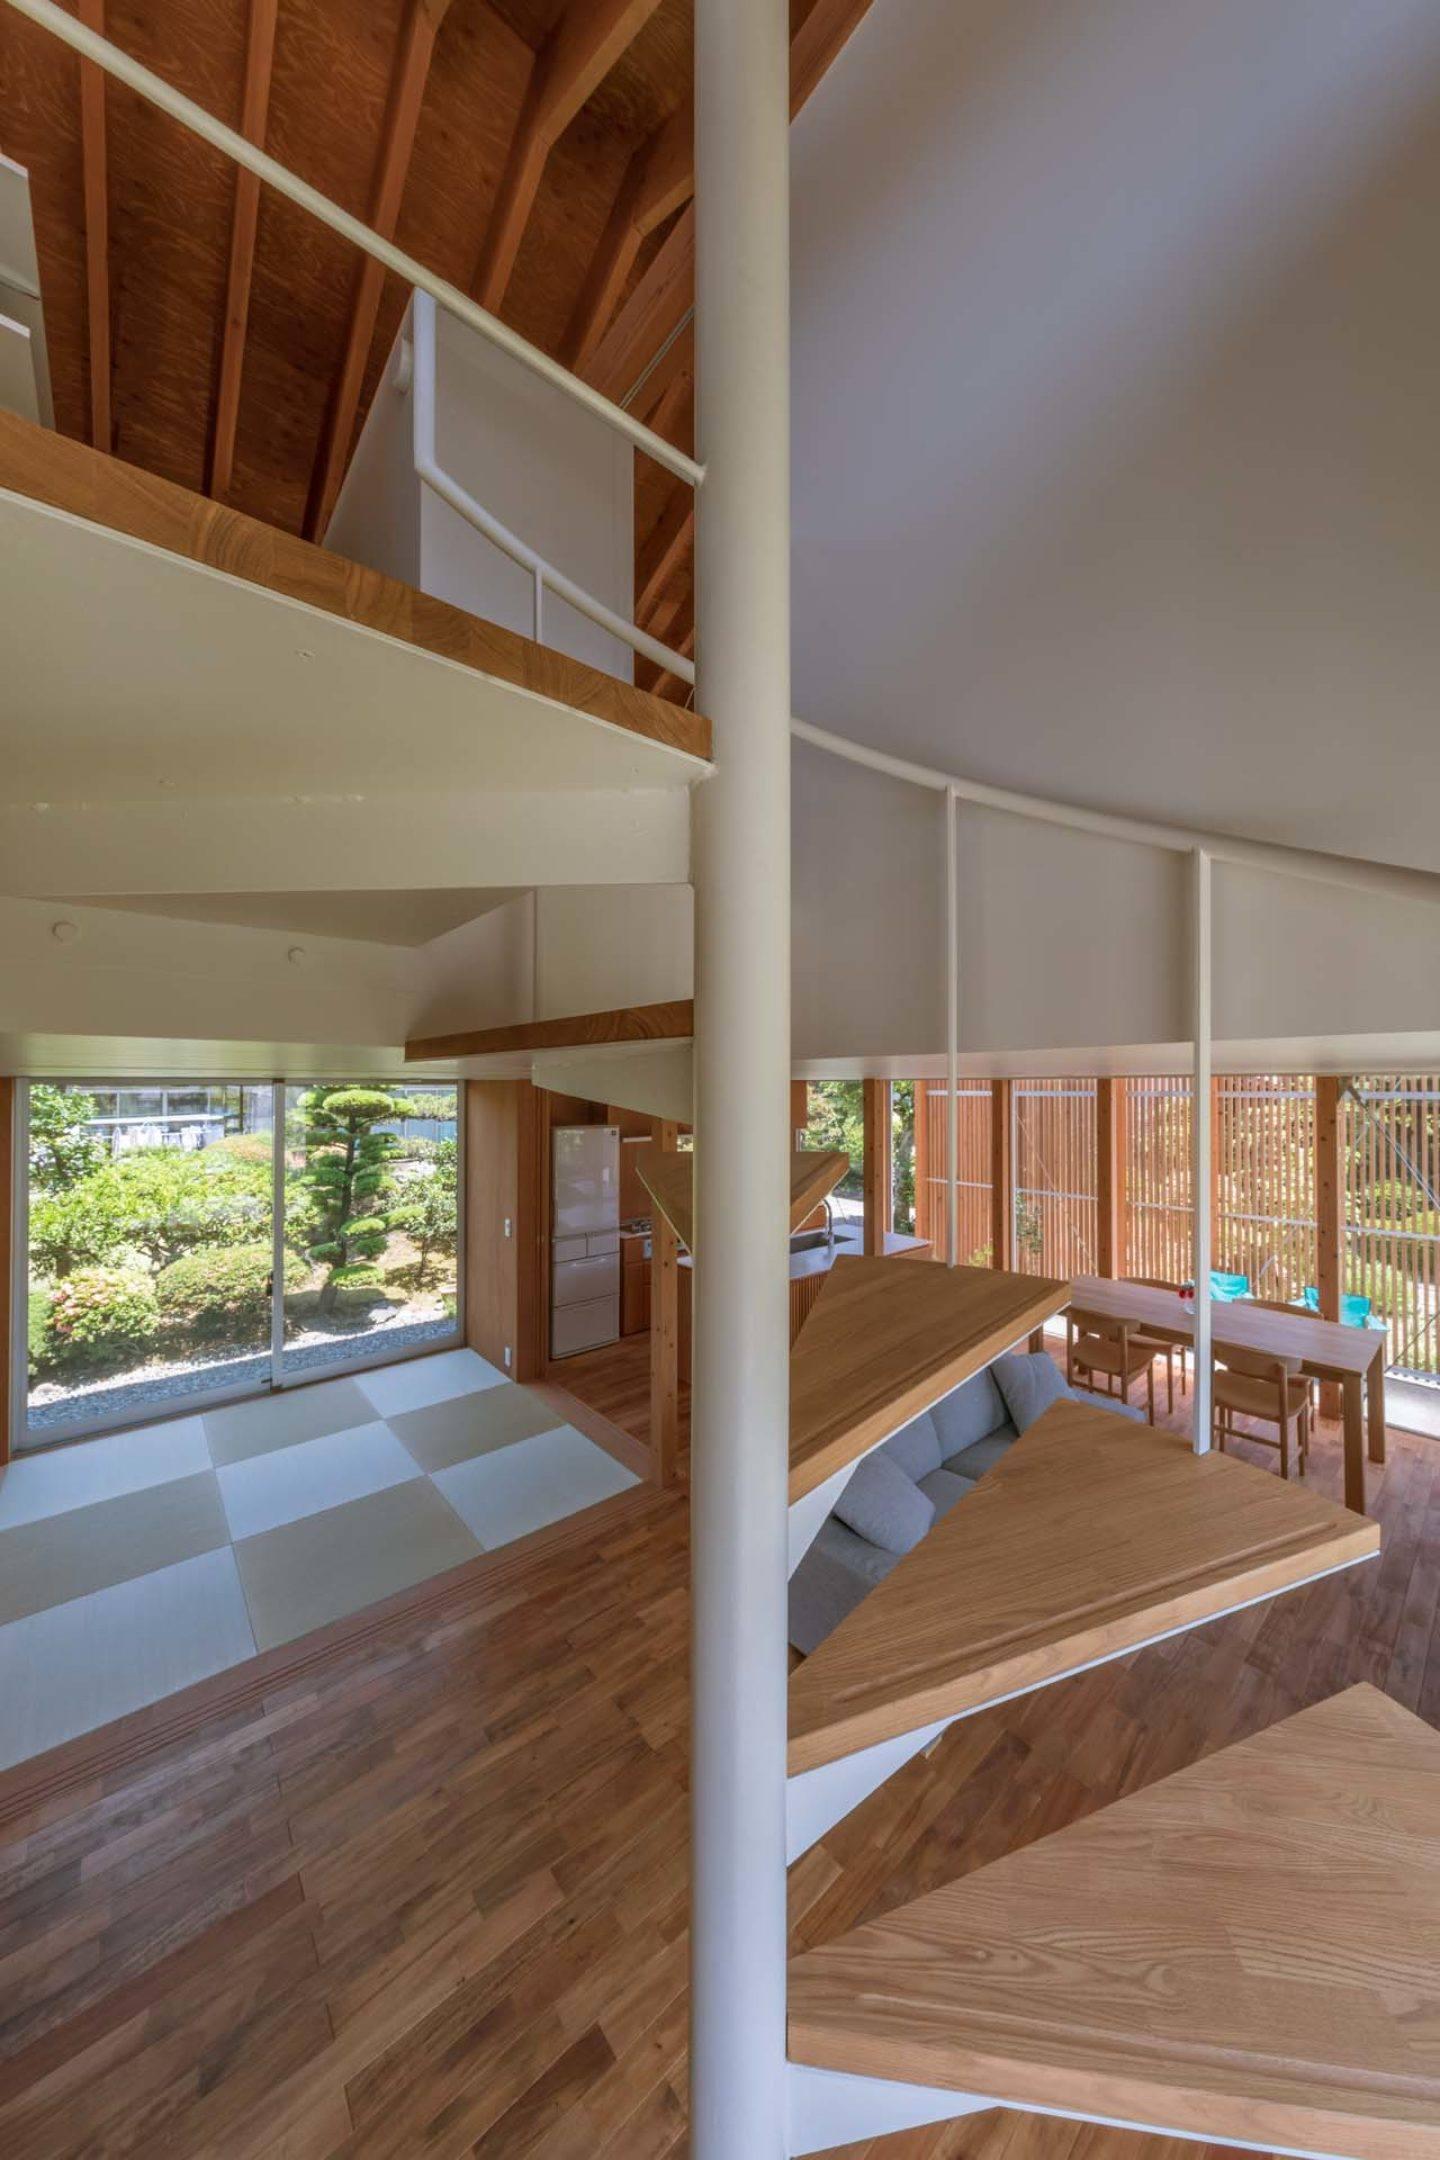 IGNANT-Architecture-Kota-Mizuishi-House-In-Otai-007